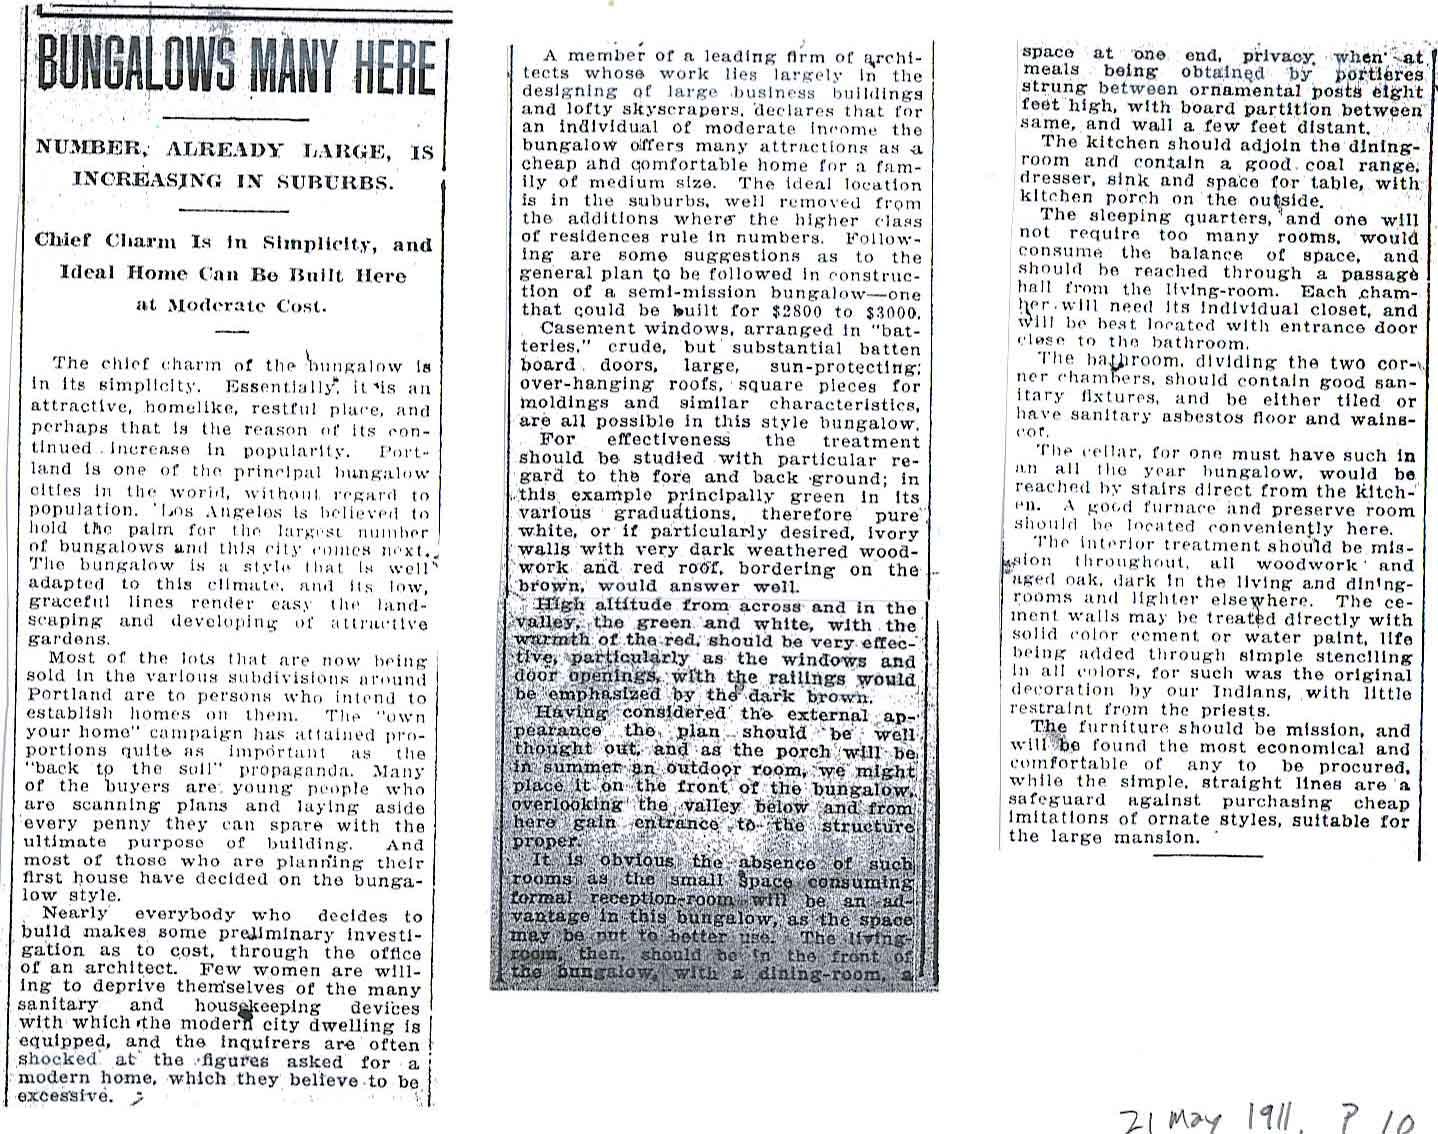 21-may-1911-bungalows-many.jpg